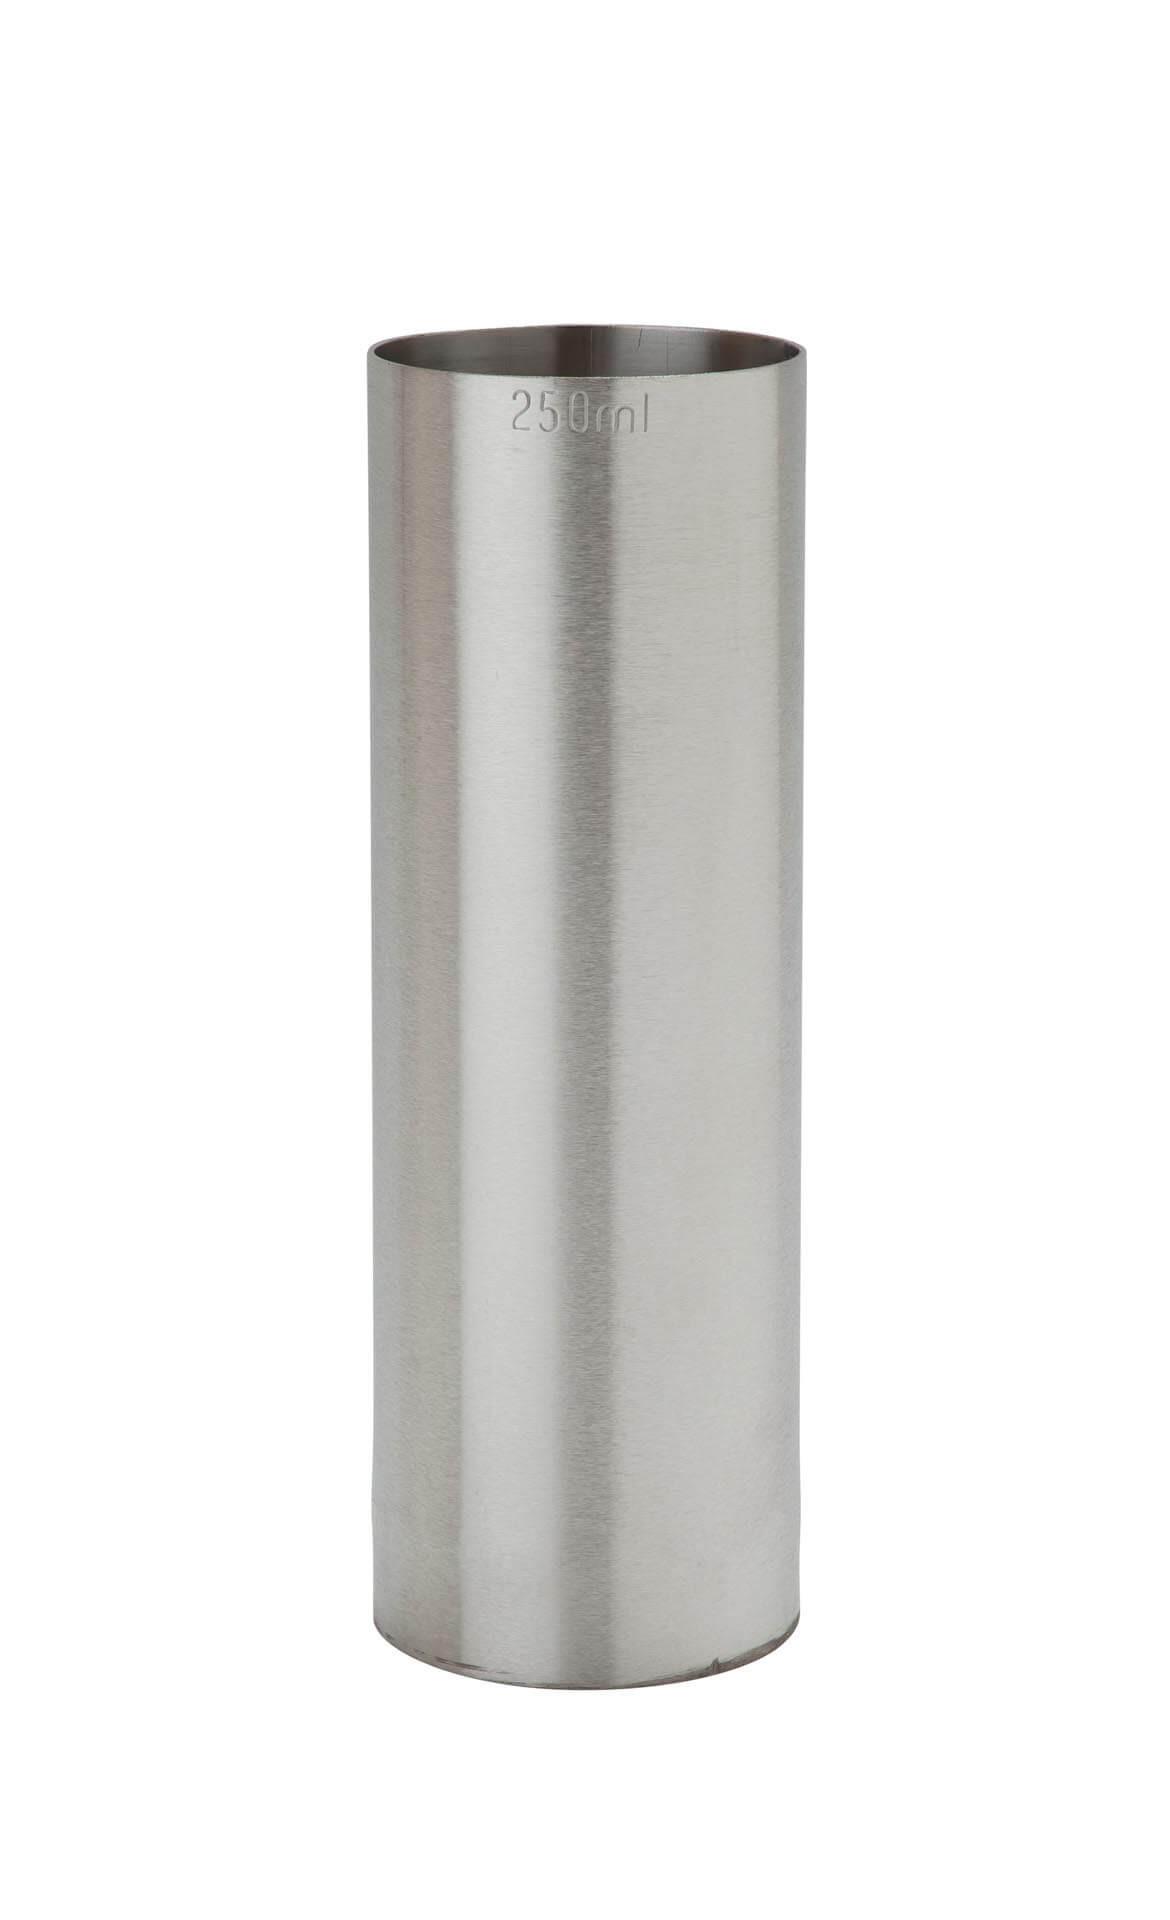 målebærger-jigger-Thimble-Measure-CE-Stamped-250-ml-mixmeister-dk